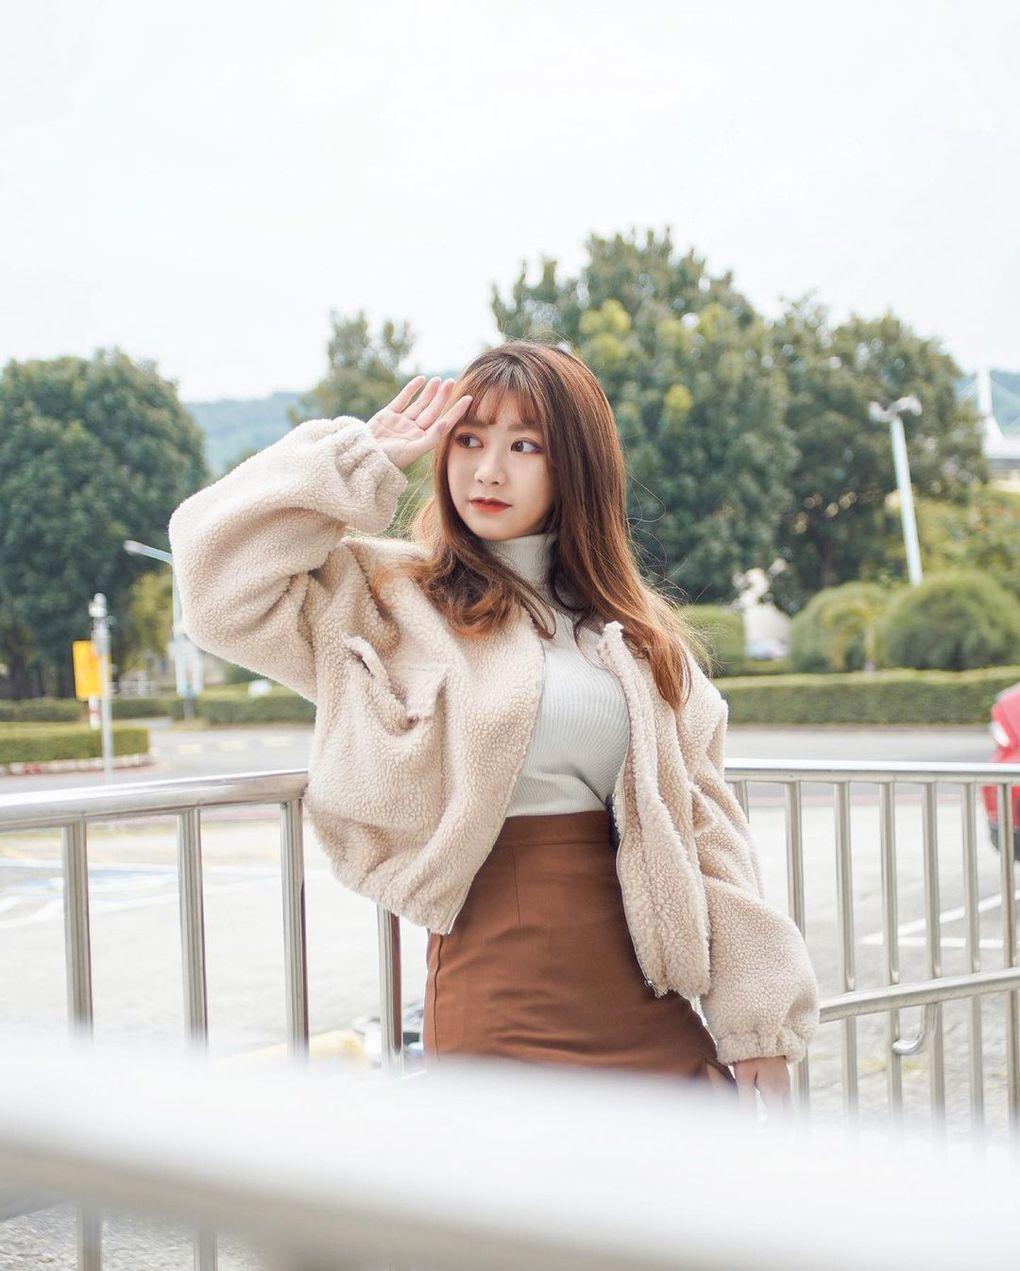 [itotii美女]甜心高中生来袭.神似韩团女星超甜妹妹以涵 网络美女 第19张